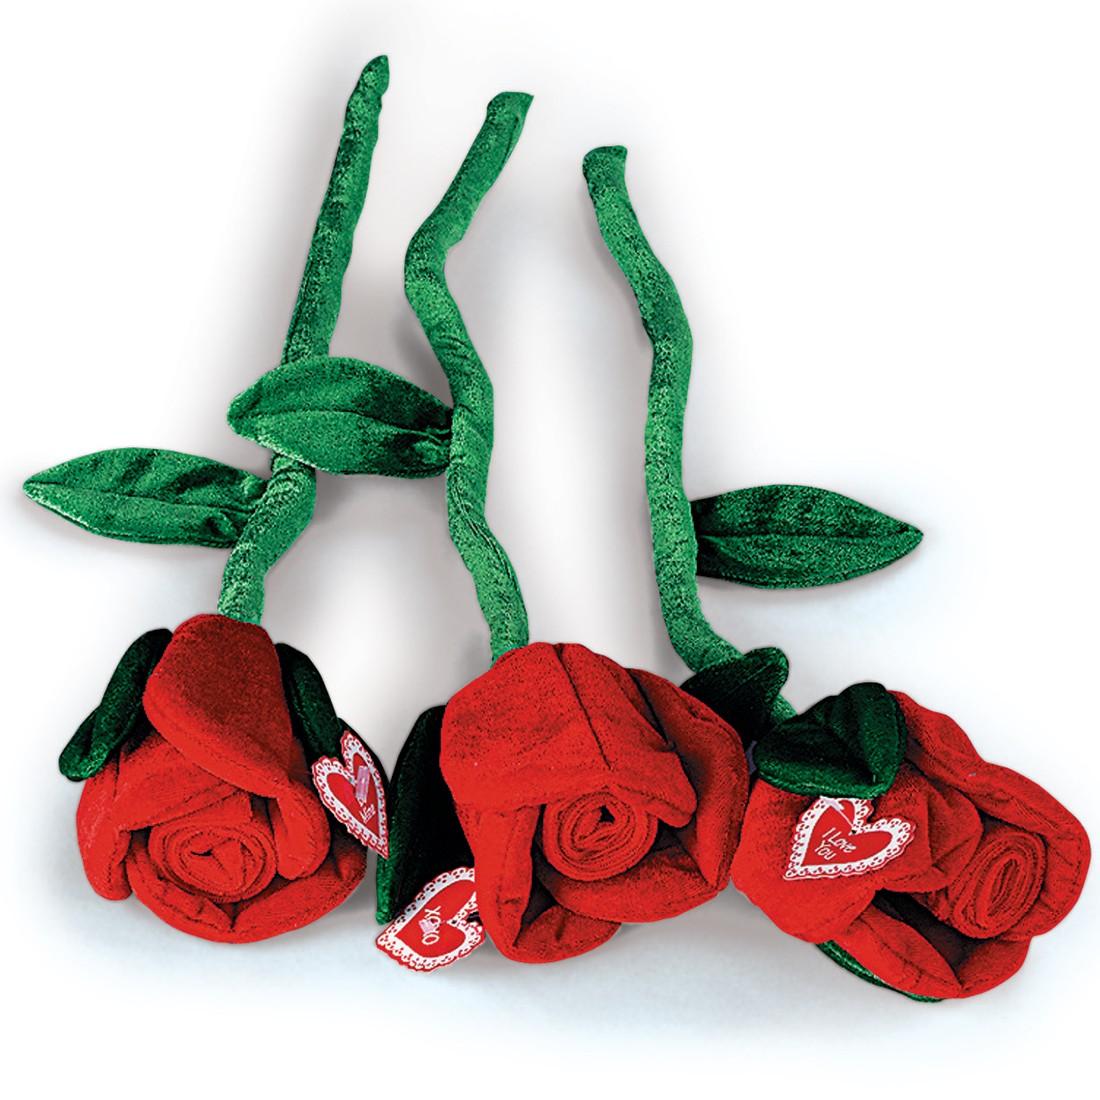 Plush Red Roses [image]